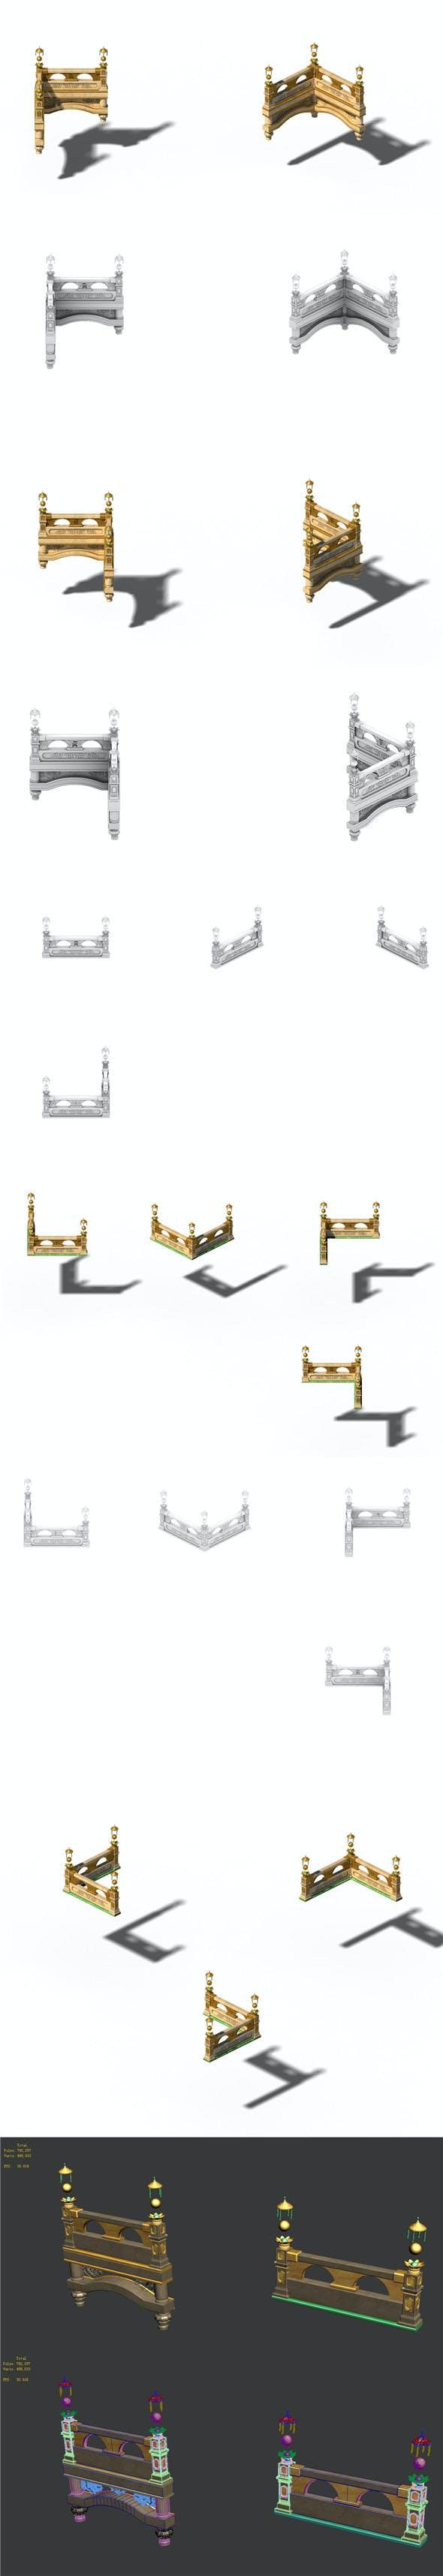 Accessories - wonderful fantasy - railings 01 - 3DOcean Item for Sale